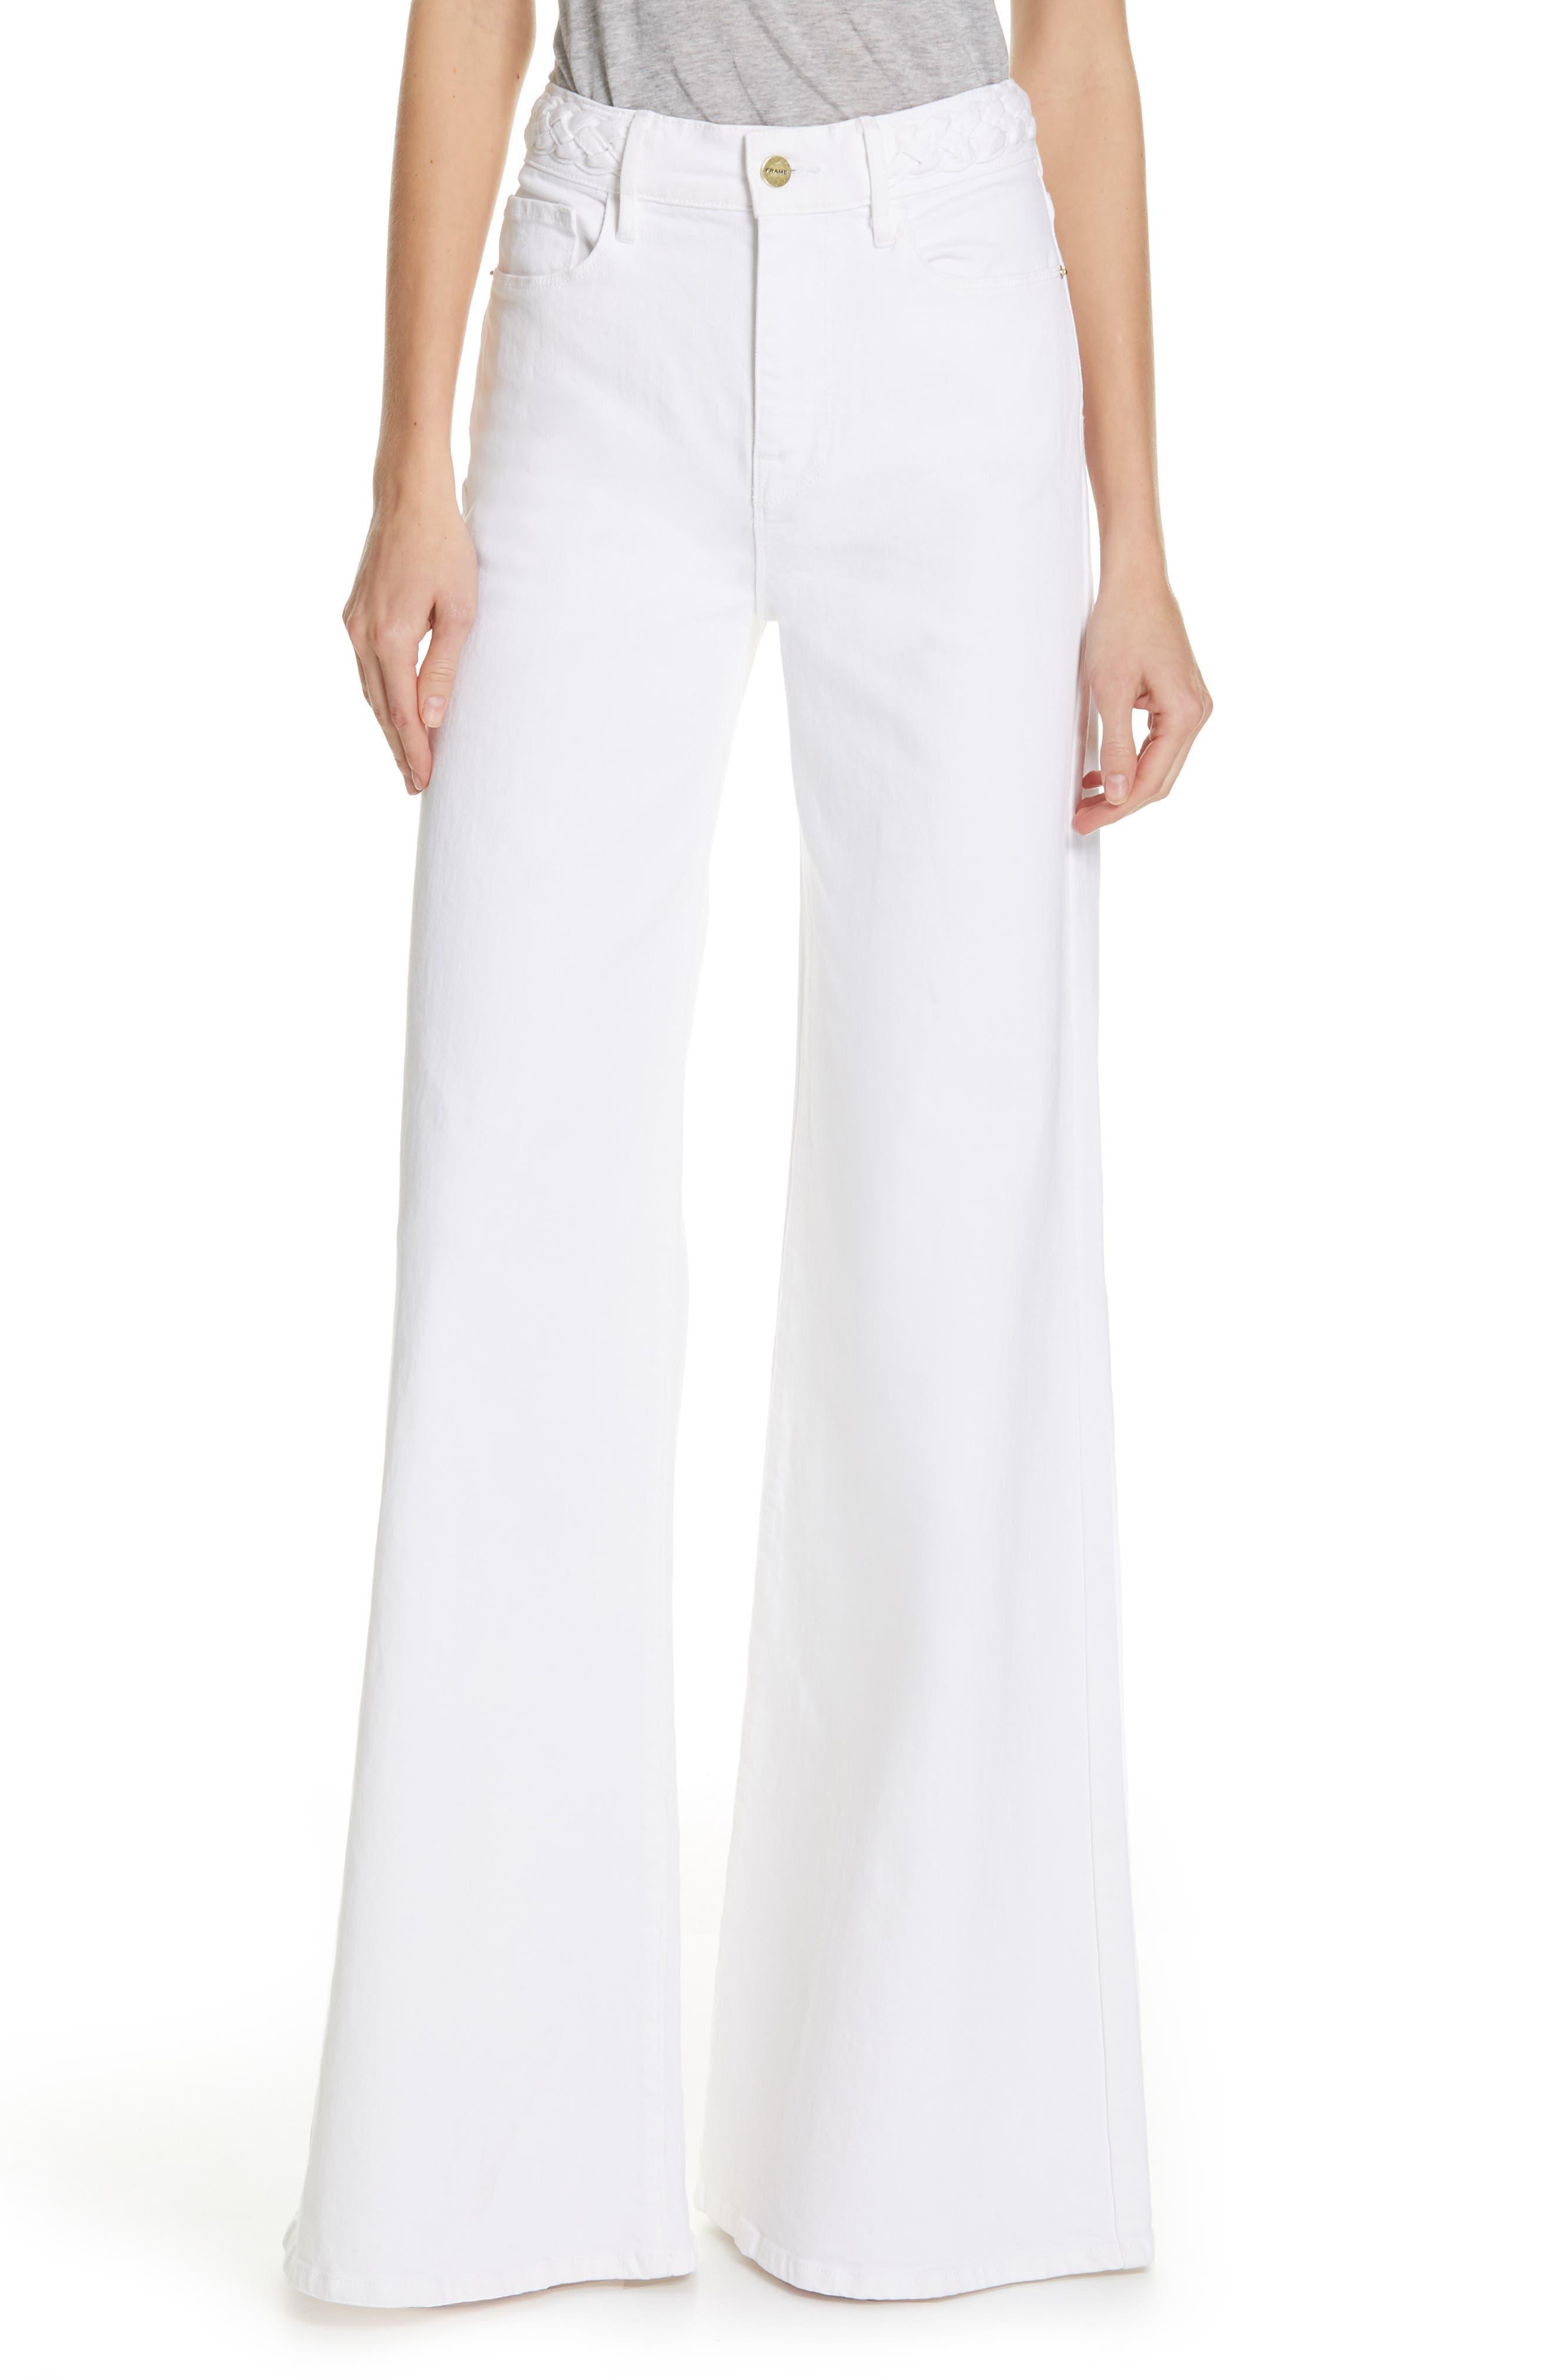 60s – 70s Pants, Jeans, Hippie, Bell Bottoms, Jumpsuits Womens Frame Le Palazzo Braid Waist Wide Leg Jeans $164.98 AT vintagedancer.com